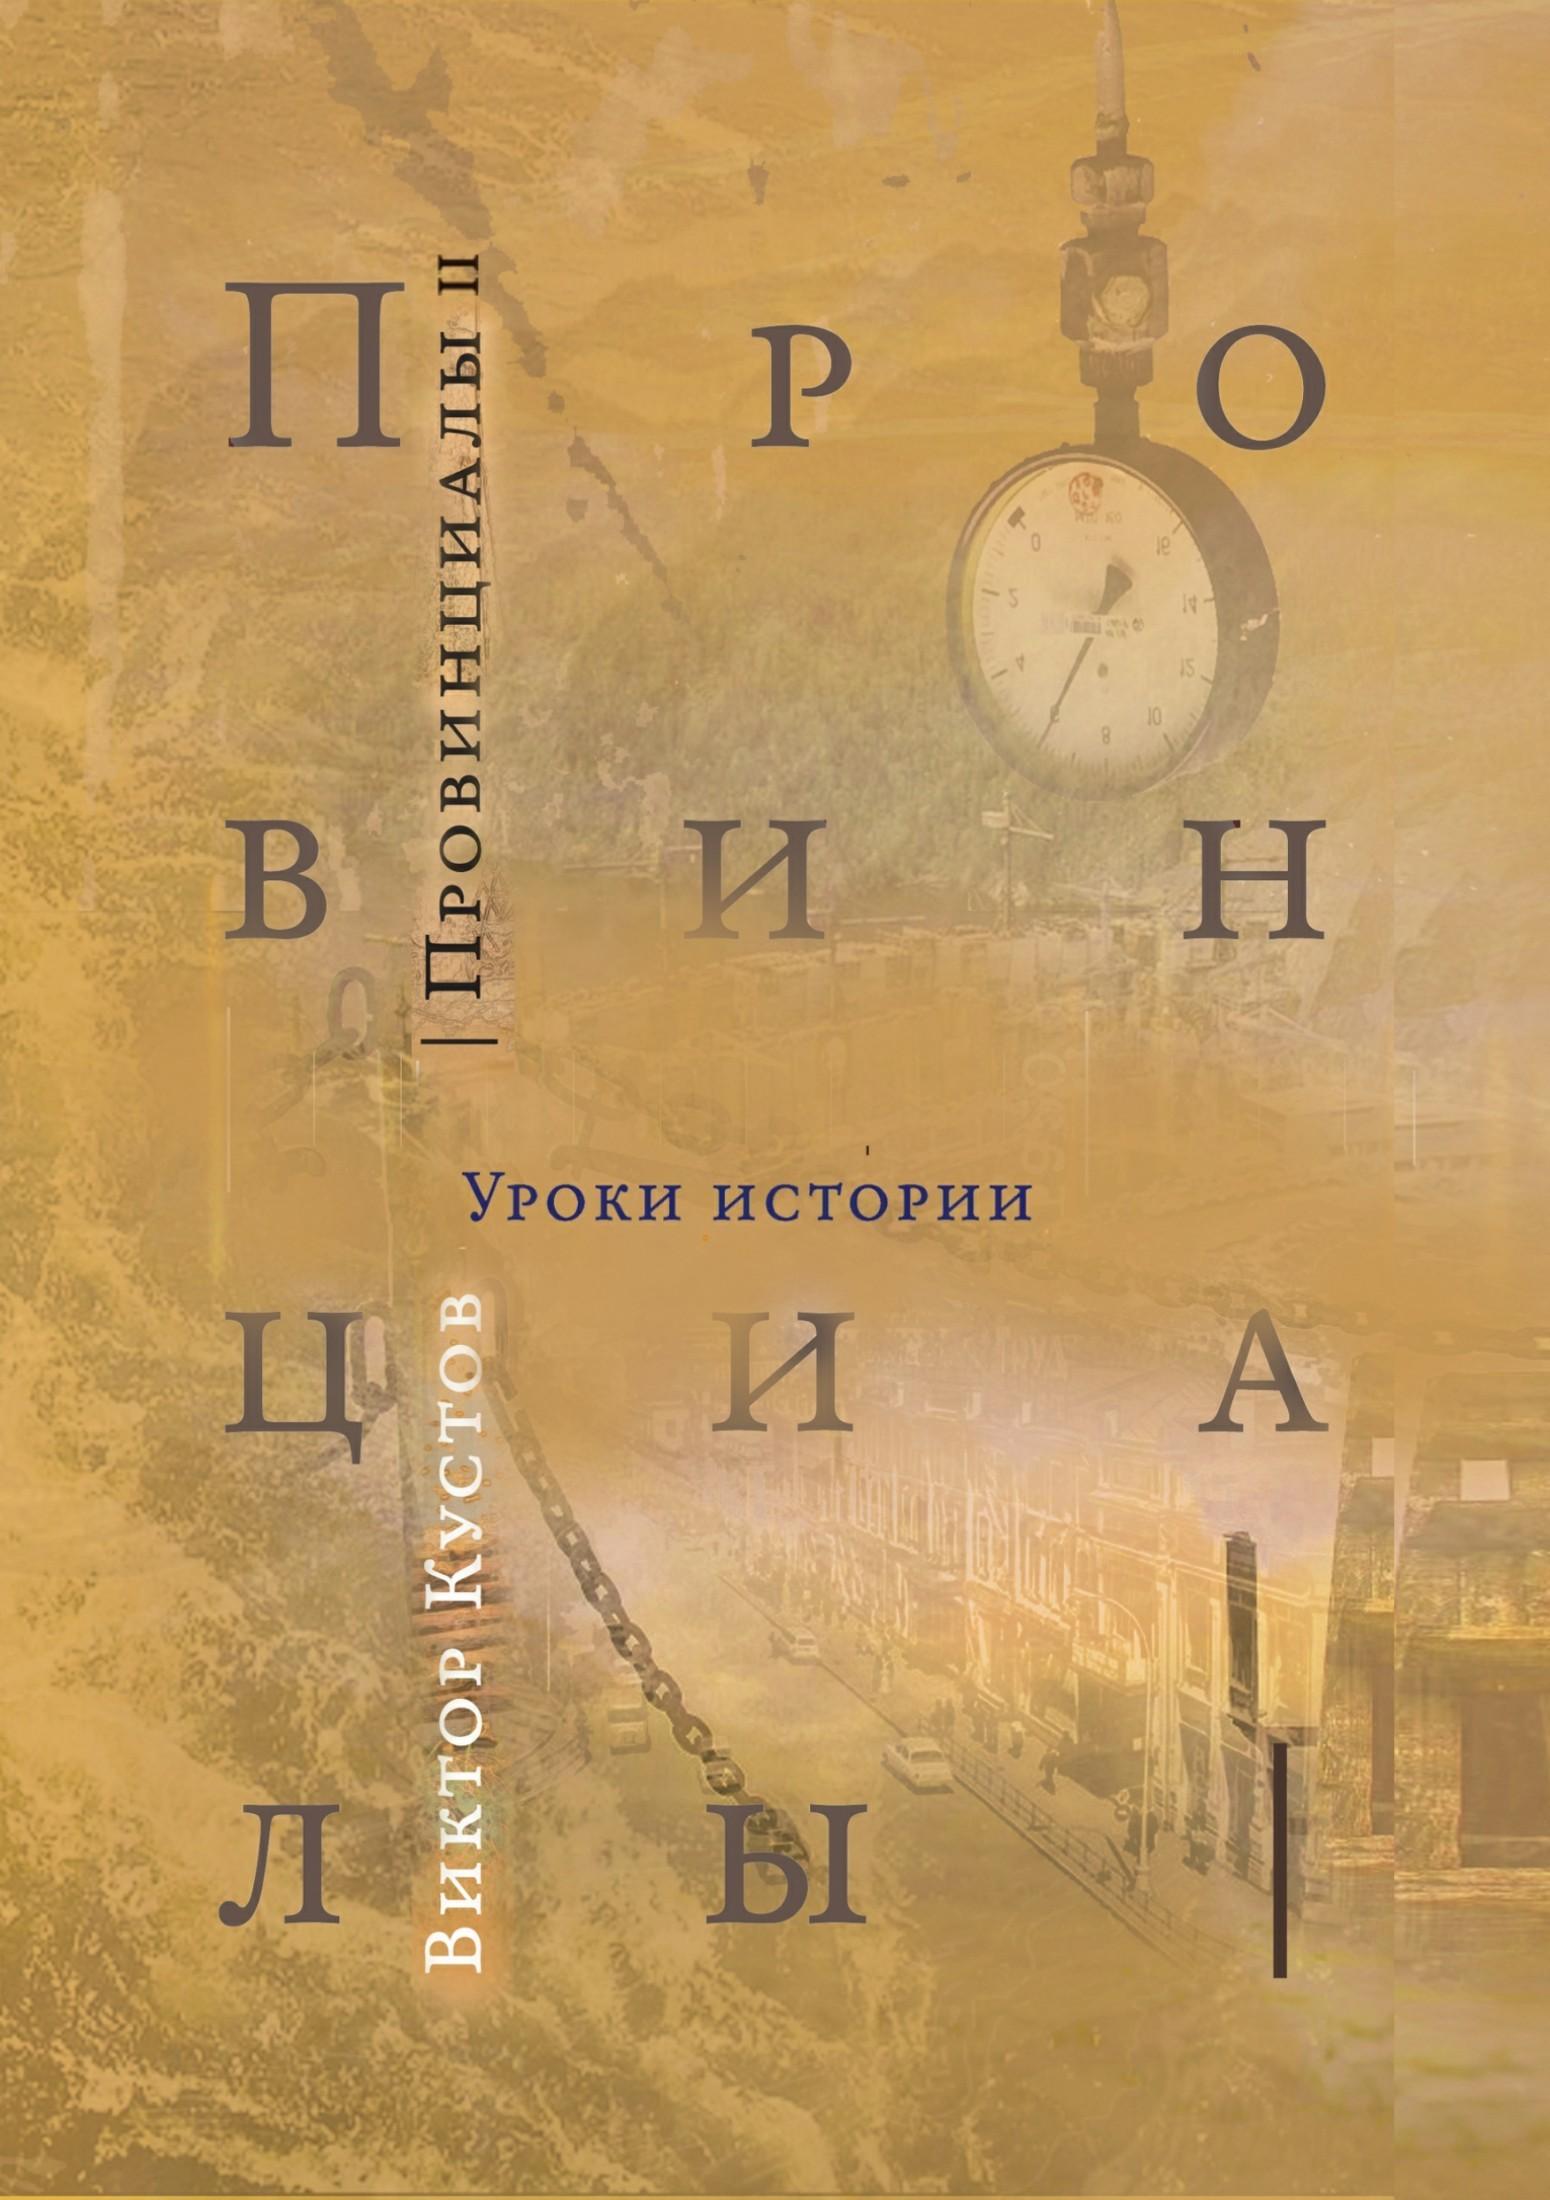 иктор Николаеич Кусто Проинциалы. Книга 2. Уроки истории